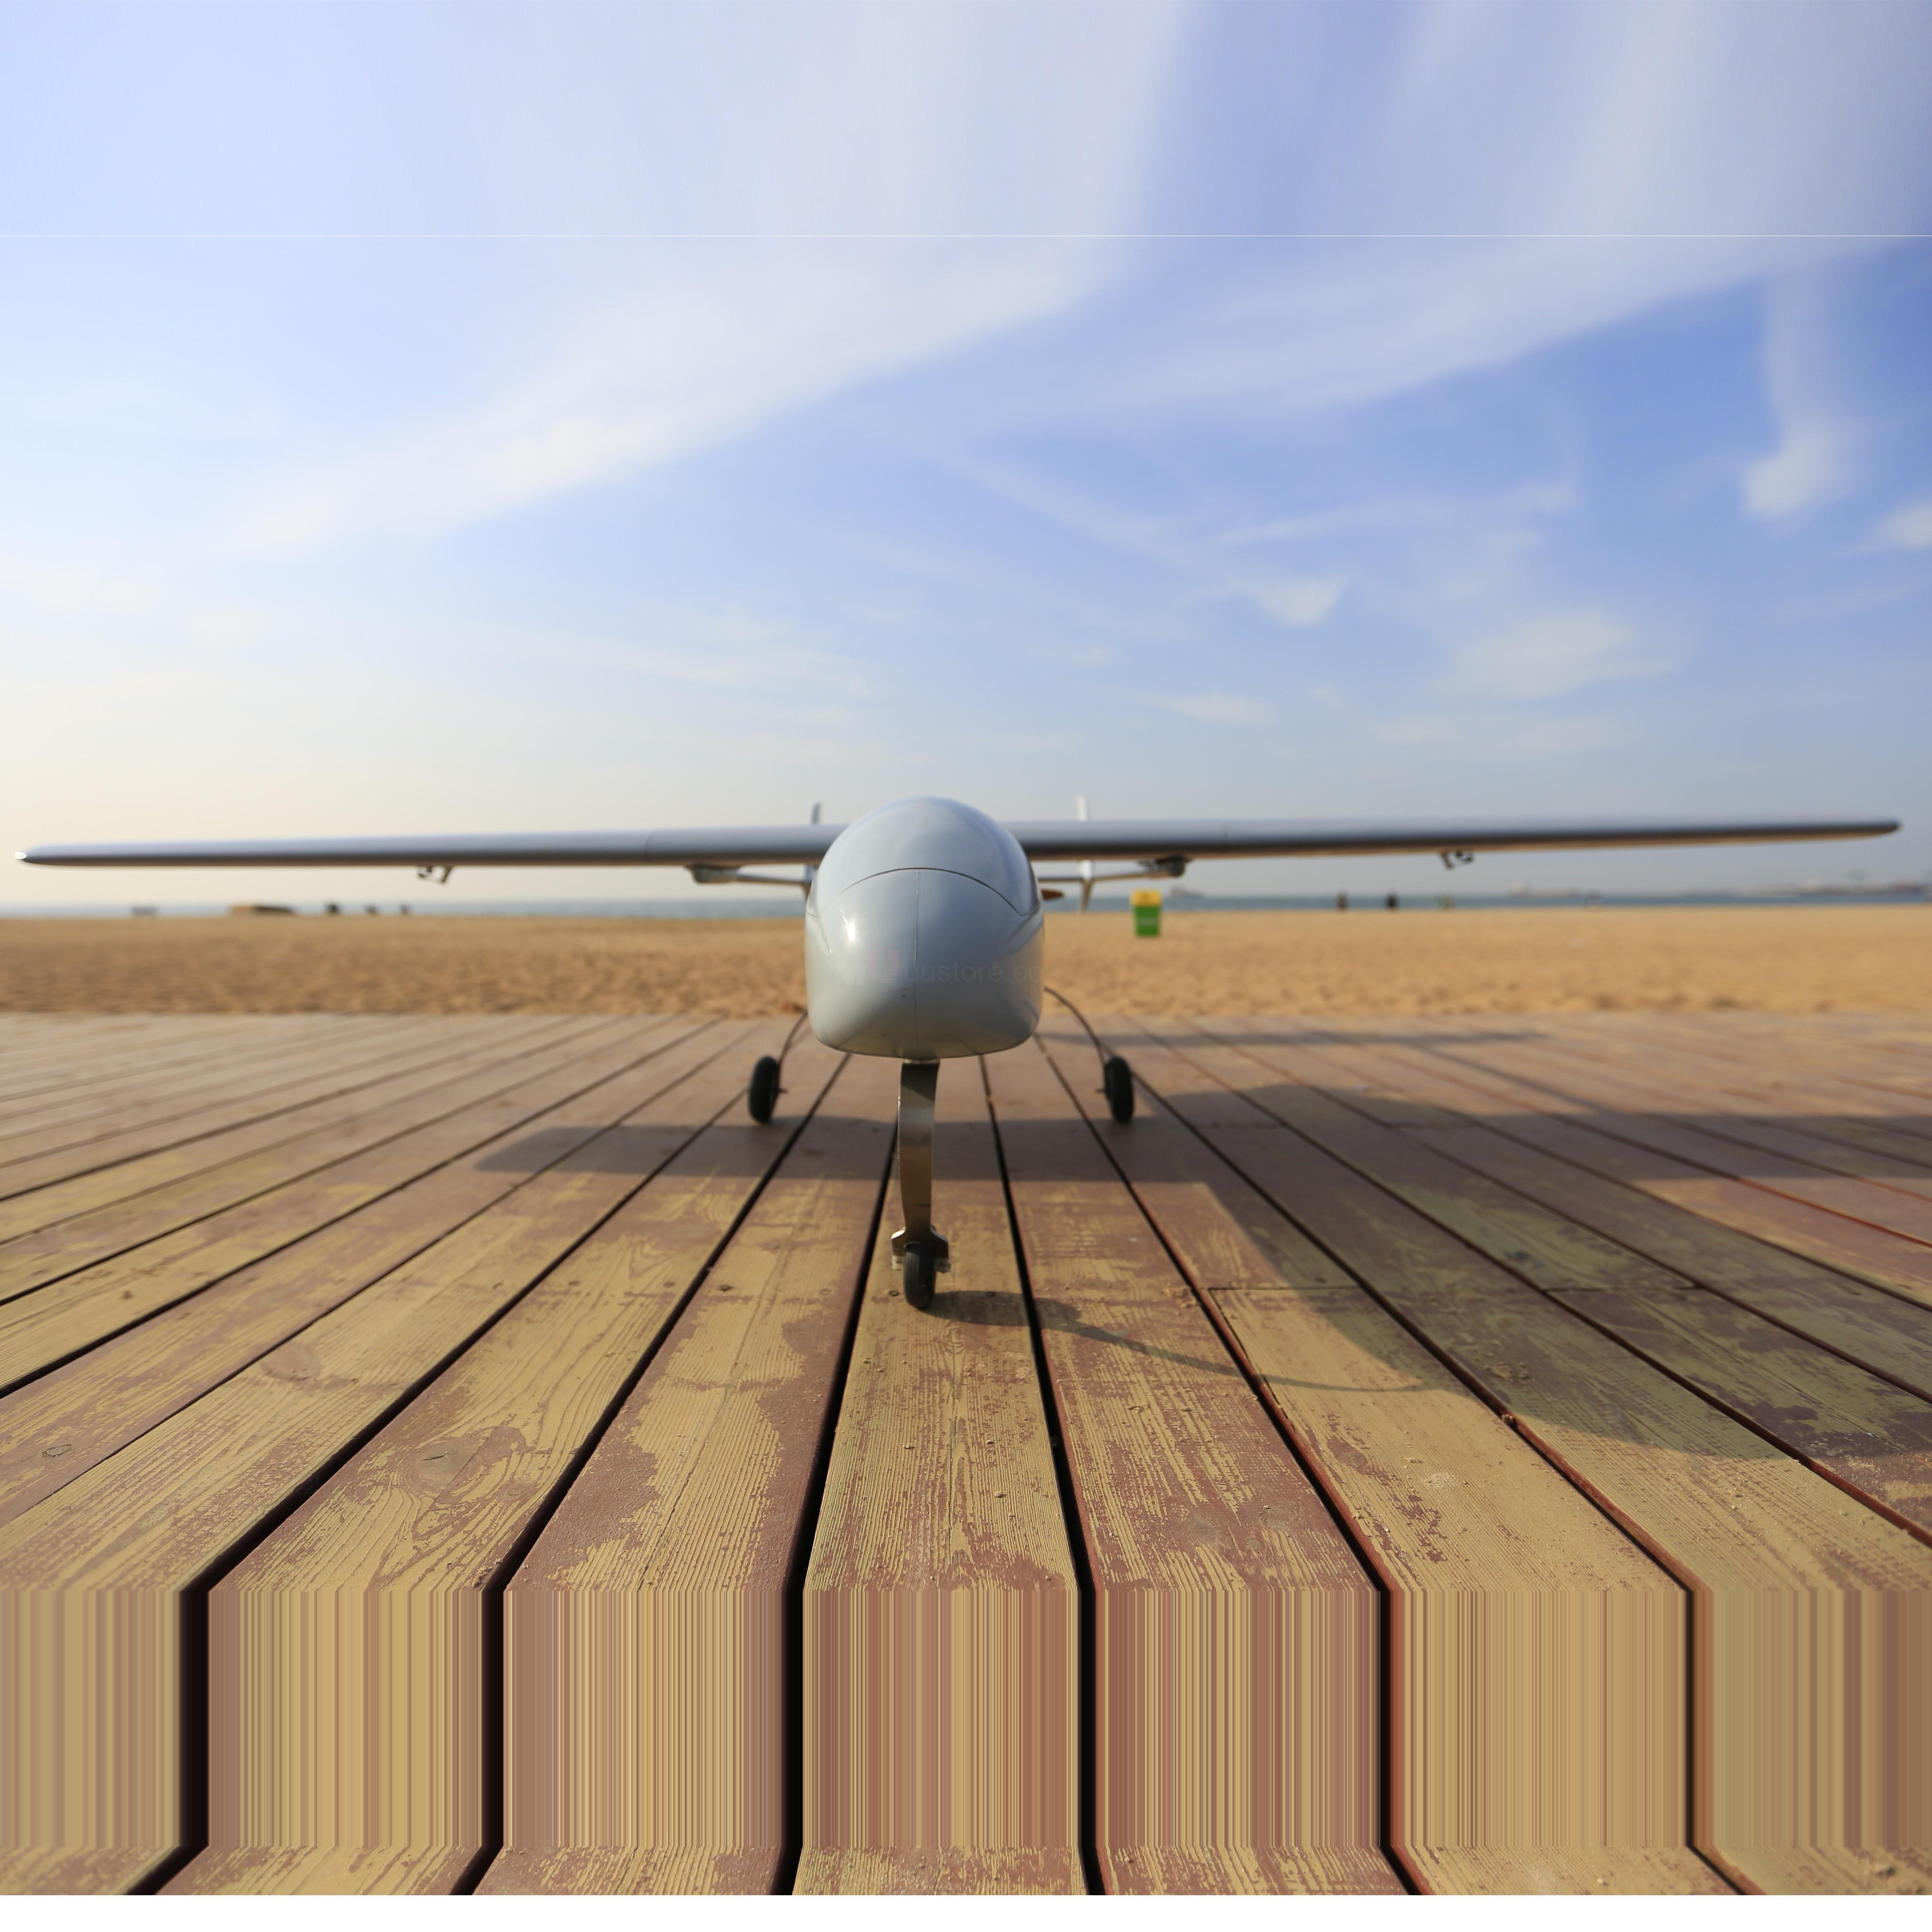 <font><b>RC</b></font> Airplane Kit Plane UAV Mini Skyeye 2.6m 2600mm T tail platform carbon fiber Tail Suit Requirement 30-35cc <font><b>engine</b></font>